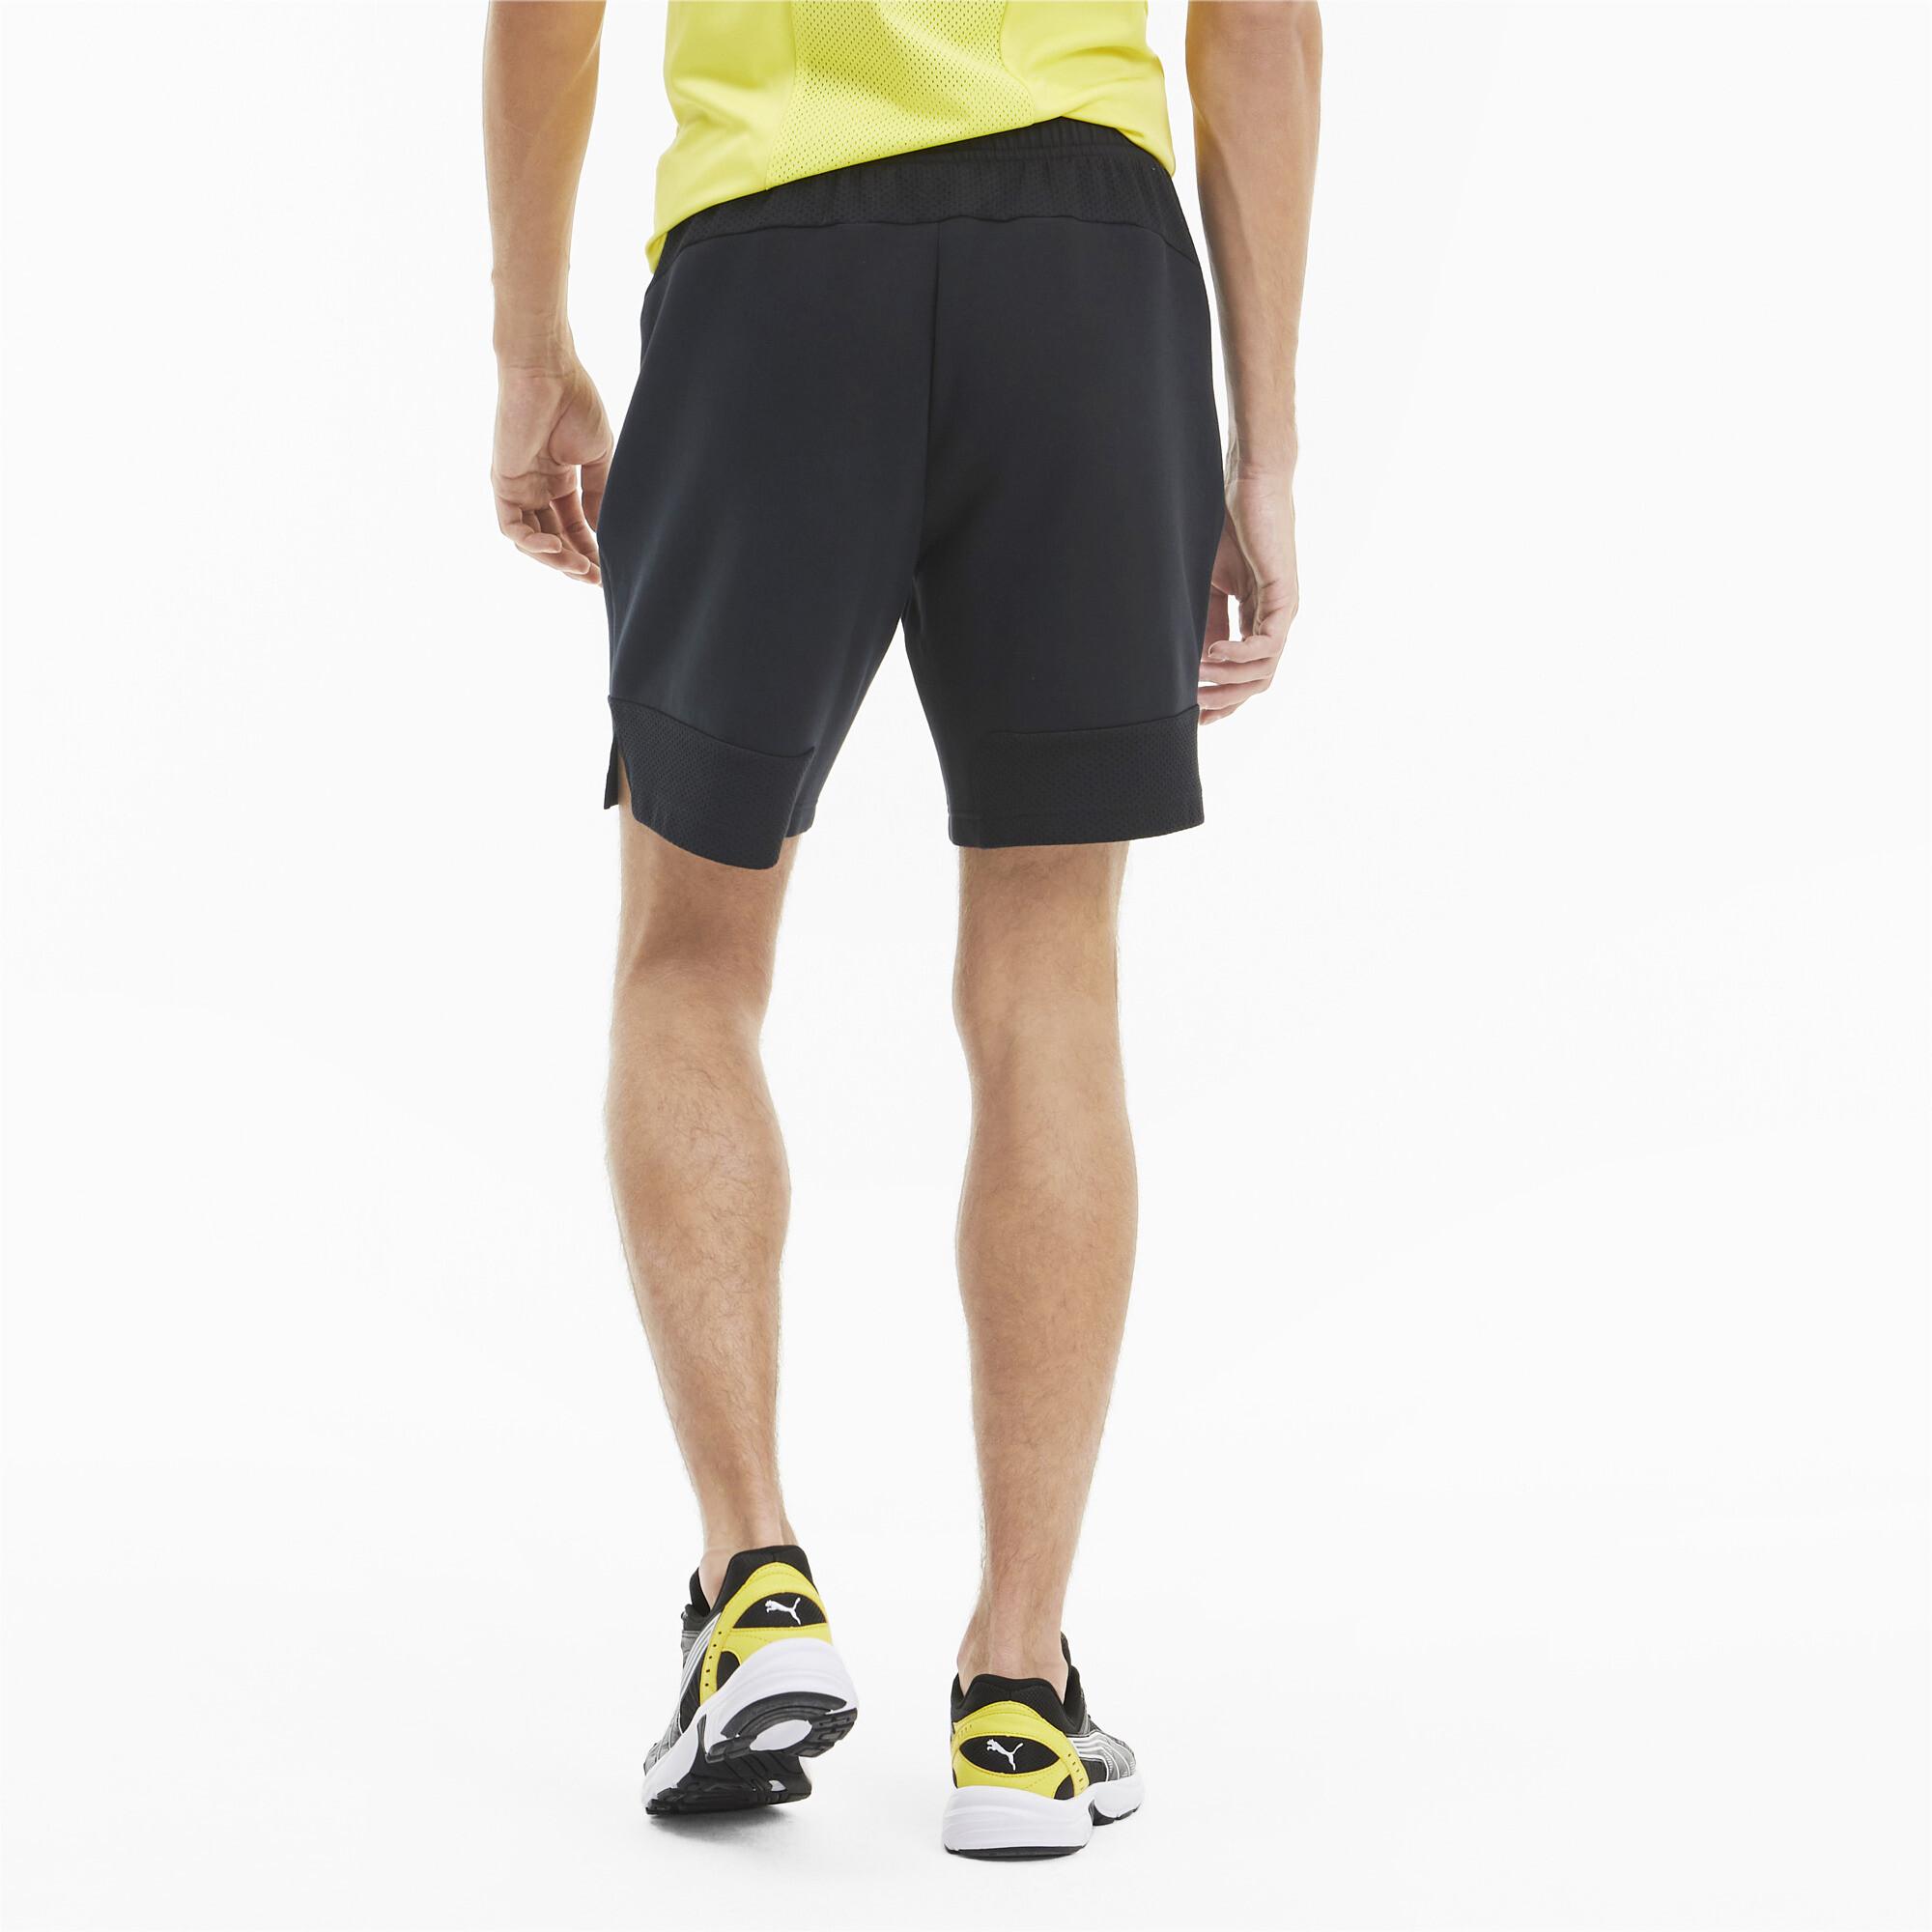 PUMA-Evostripe-Men-039-s-Shorts-Men-Knitted-Shorts-Basics thumbnail 5